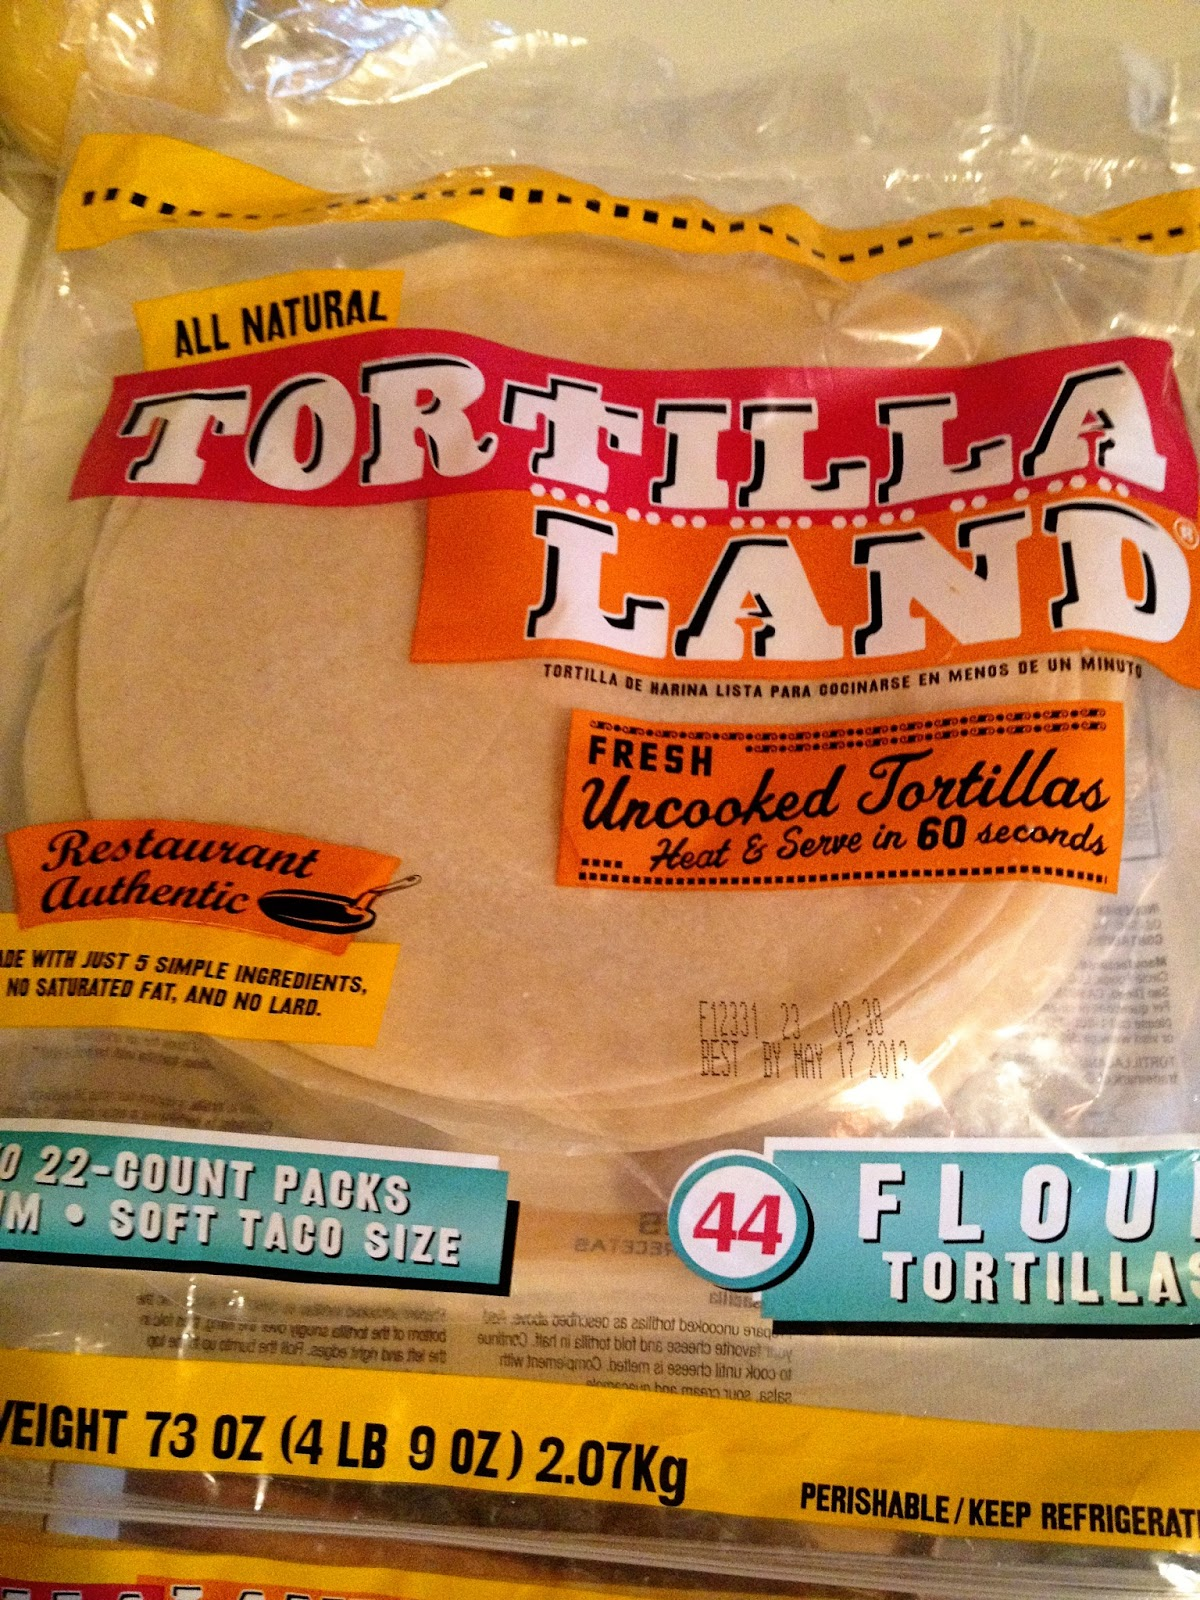 Good Eats Raw Tortillas Tortilla Land From Costco Brooke Romney Writes